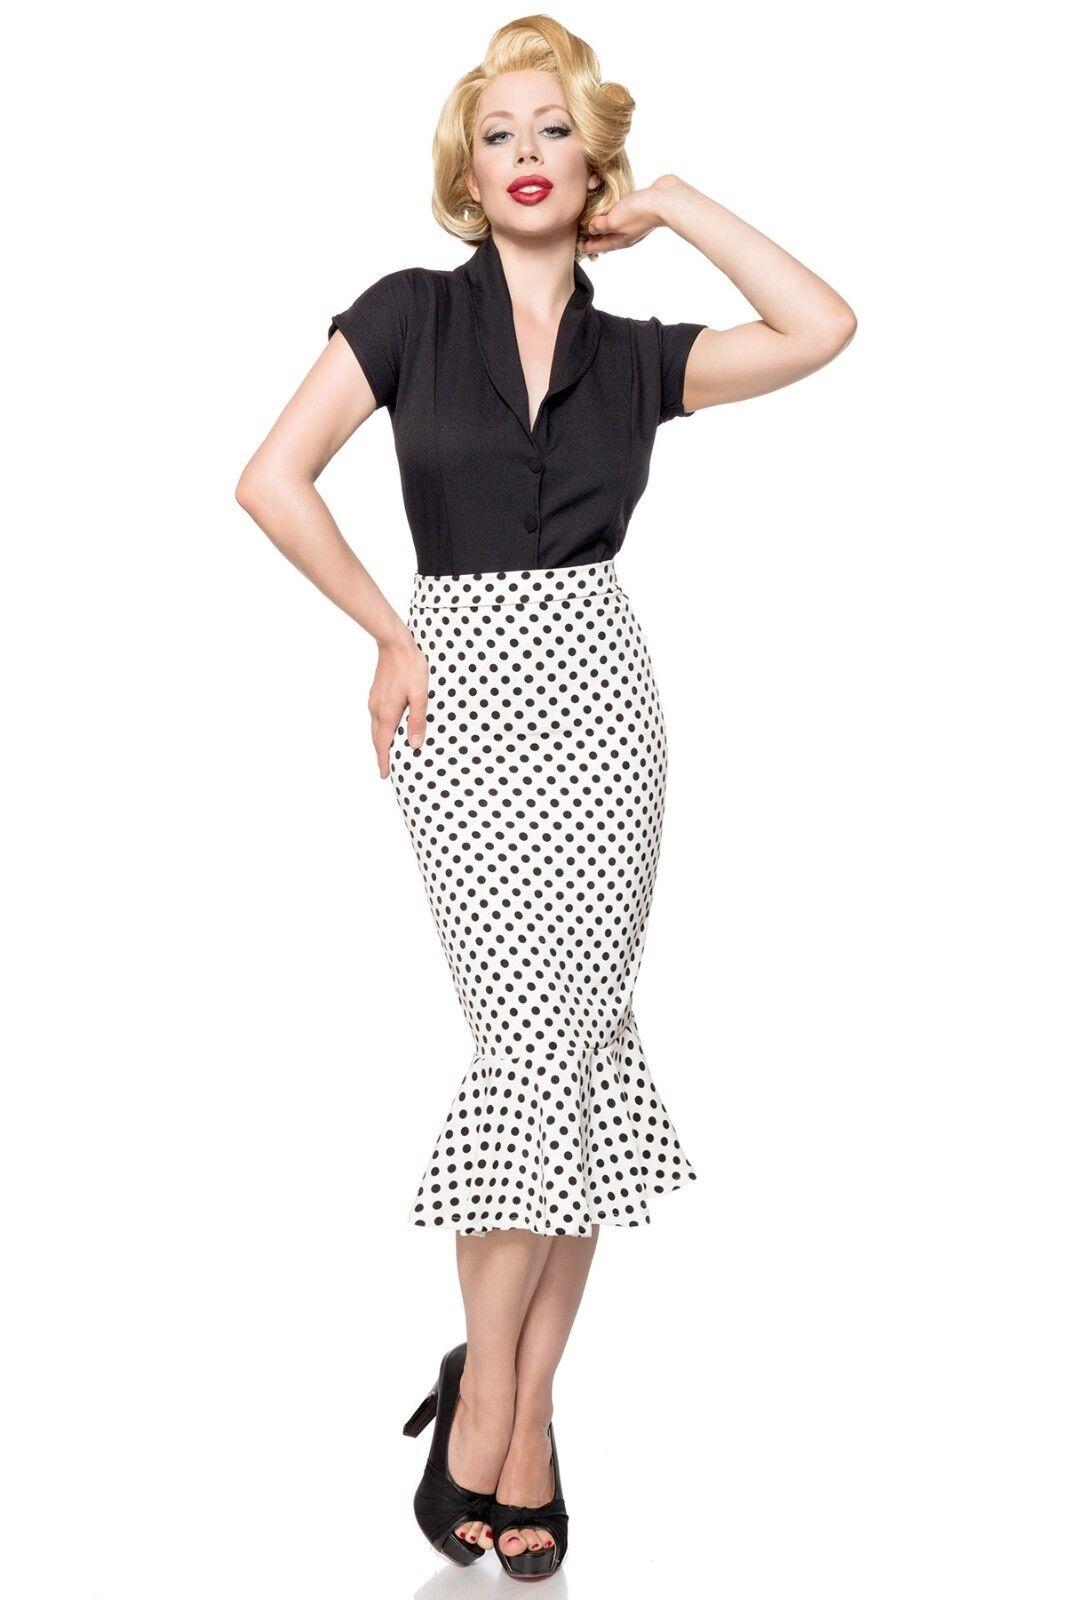 Sexy GONNA TUBINO pois black bianco XS,S,M,L,XL,2XL,3XL (da 38 a 50) moda retro